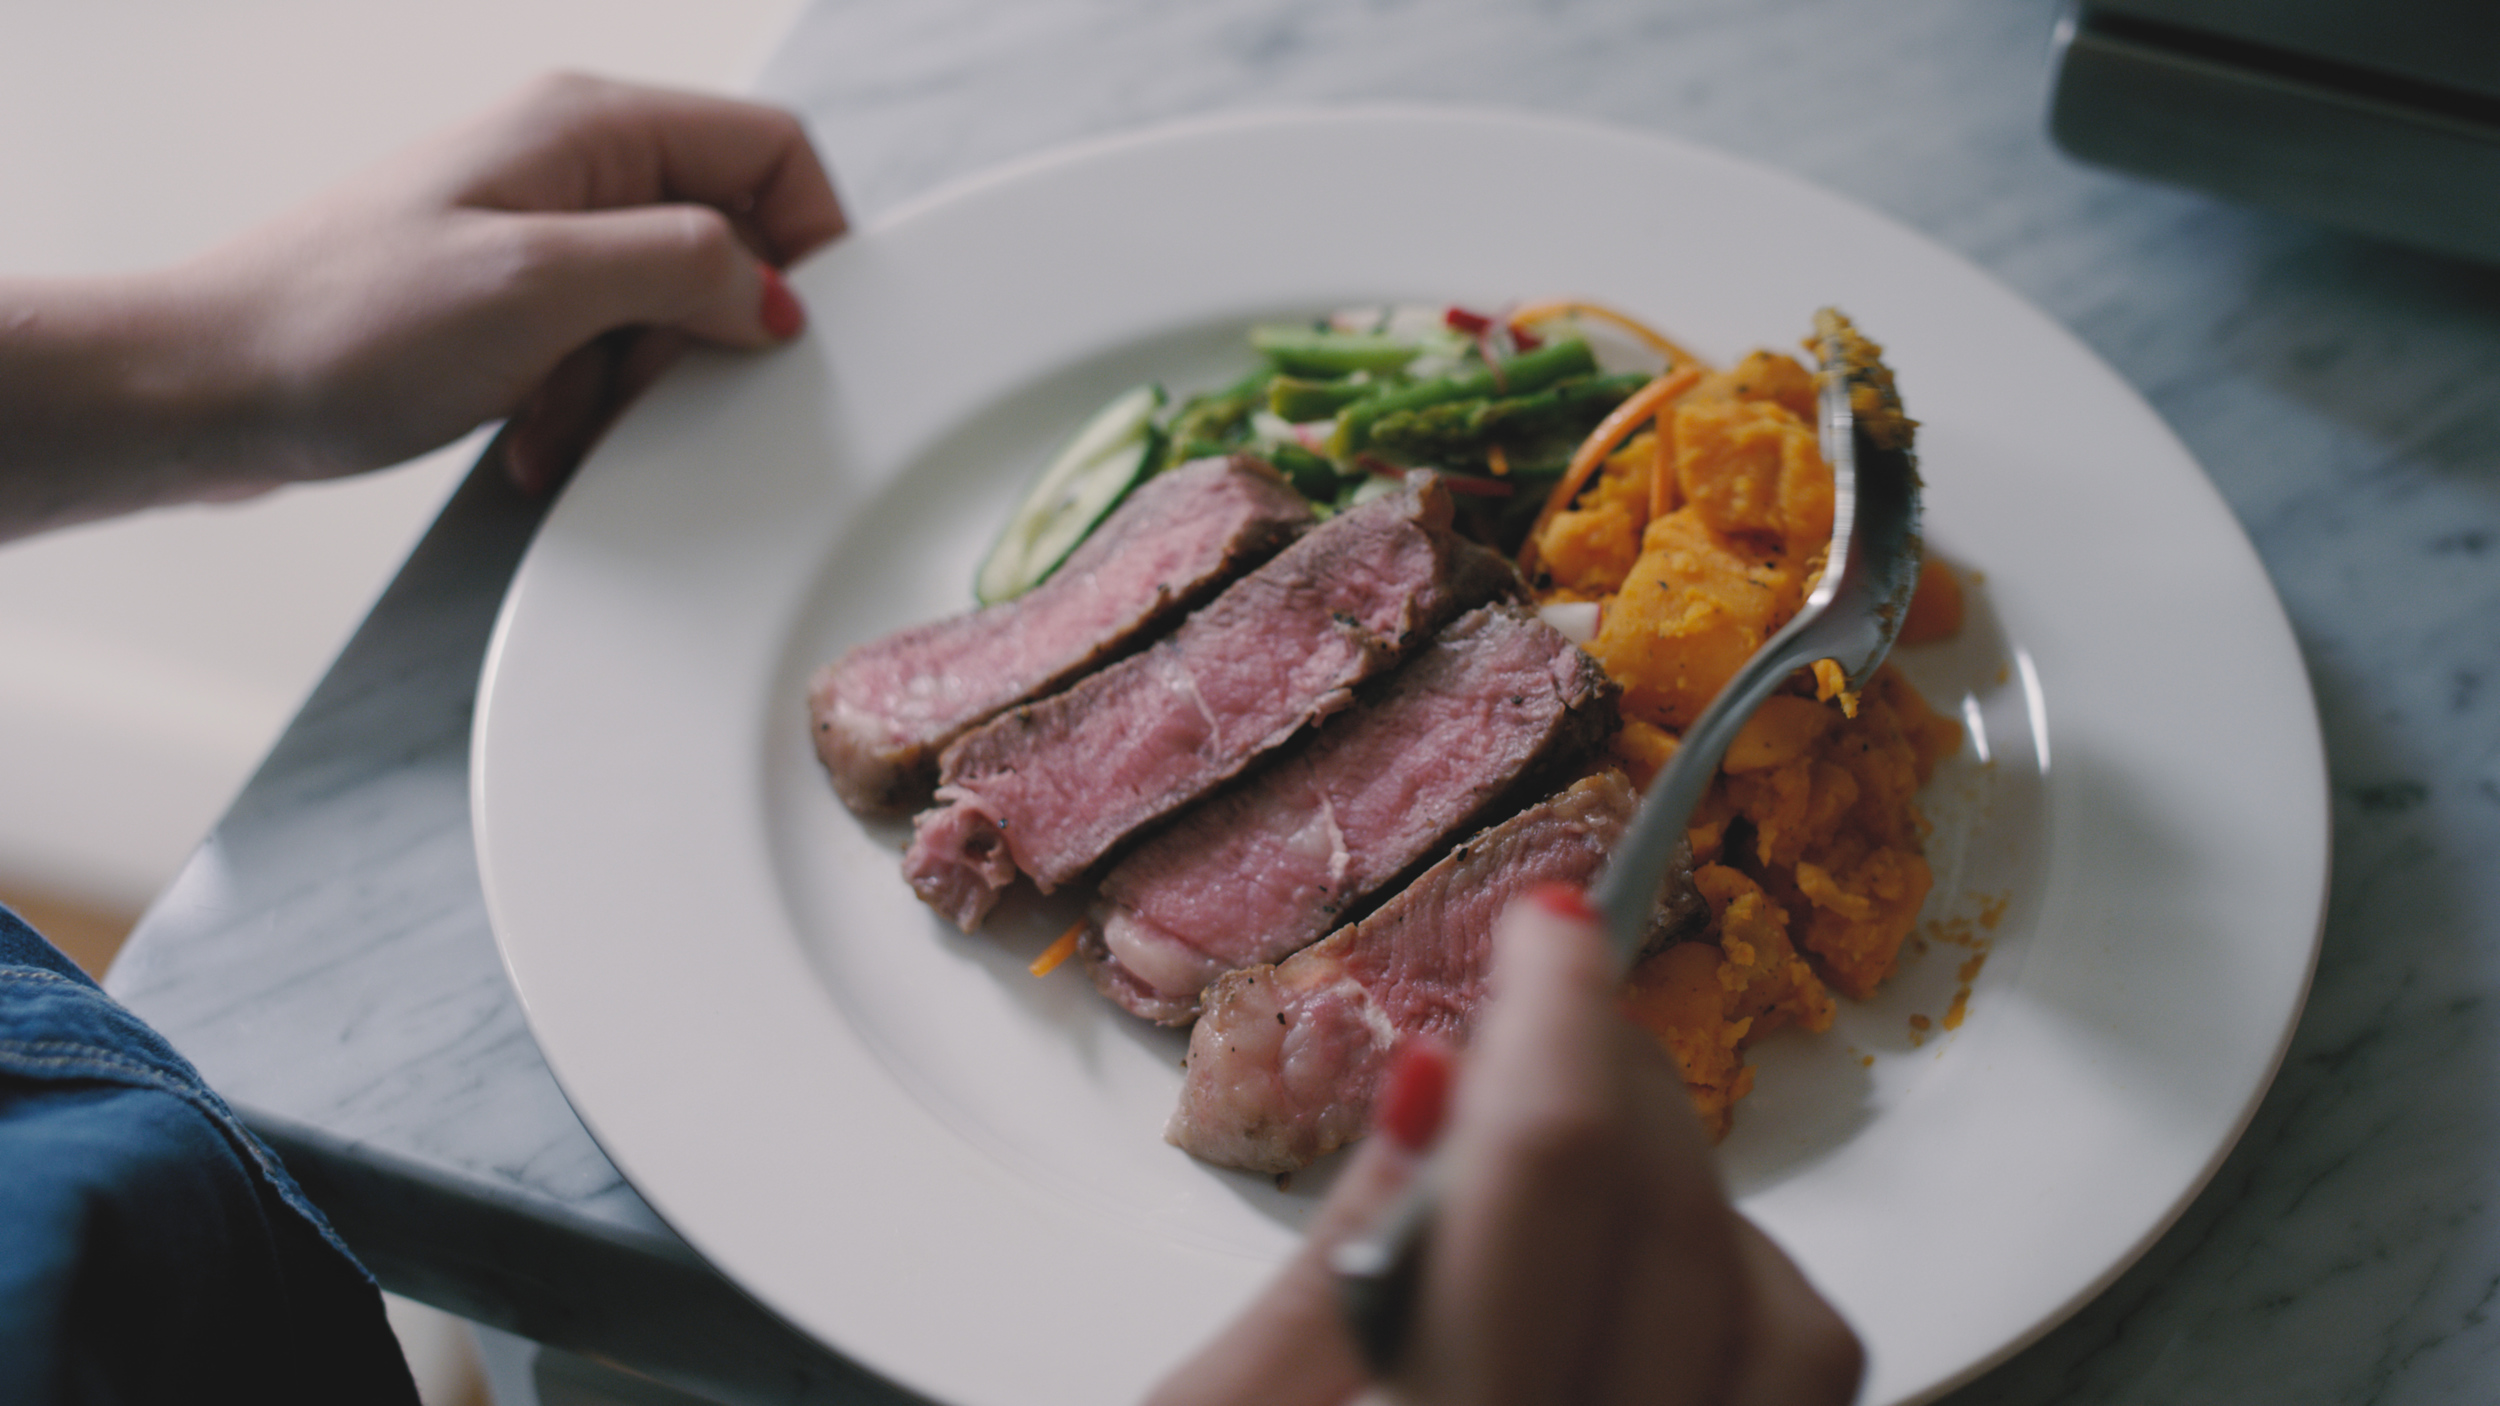 los angeles-food-steak-dinner-meal-prizm-commercial-woodwalk